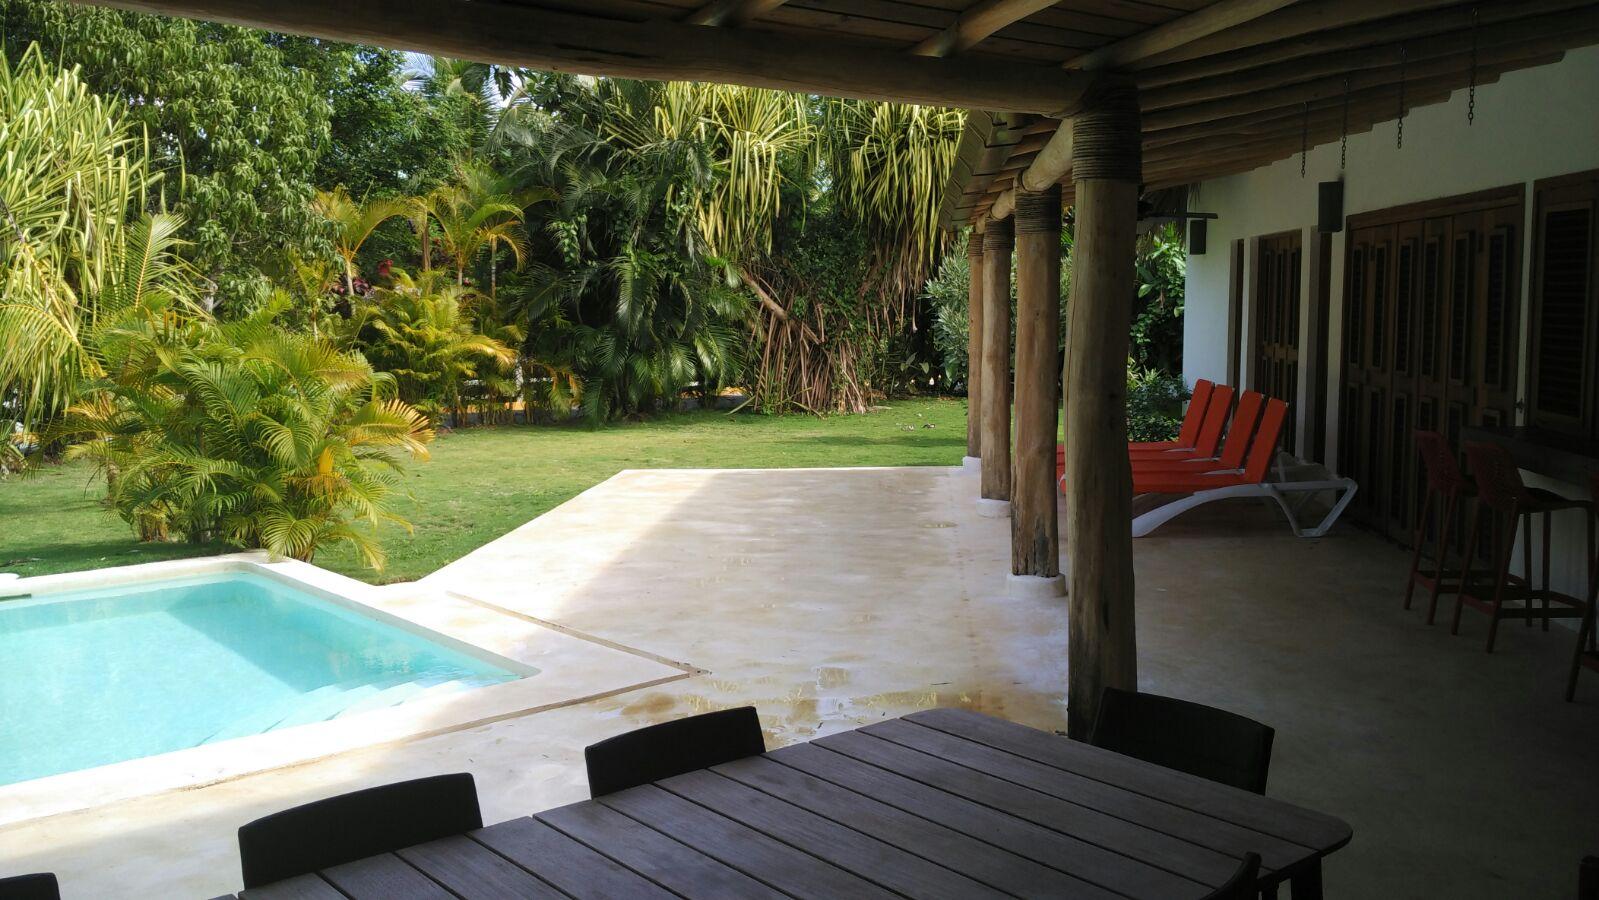 Villa for rent Las Terrenas Cote ci cote la11.jpeg